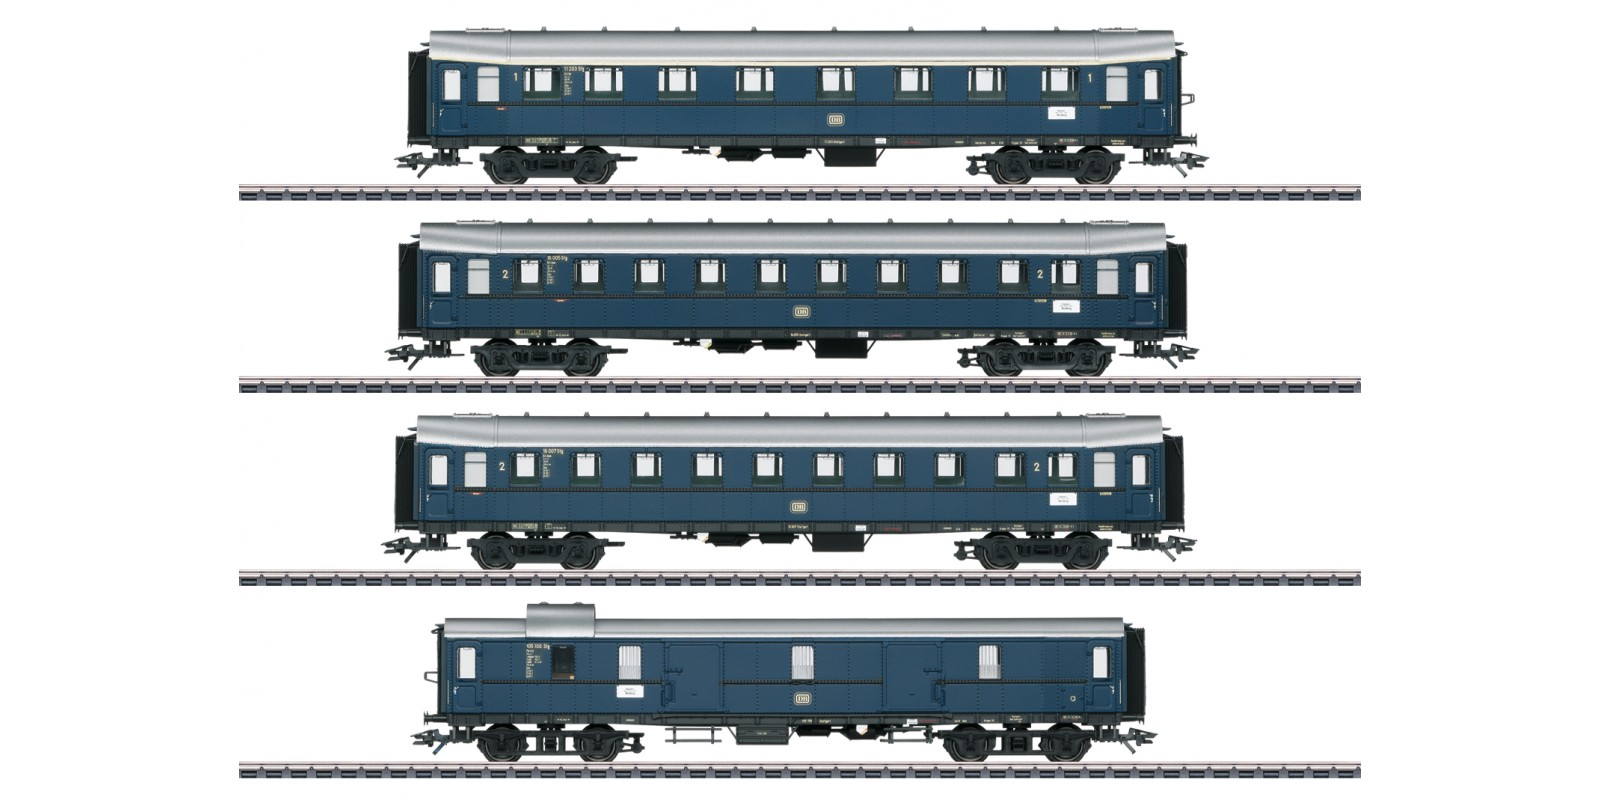 042228 Express Train Passenger Car Set for the Class E 17